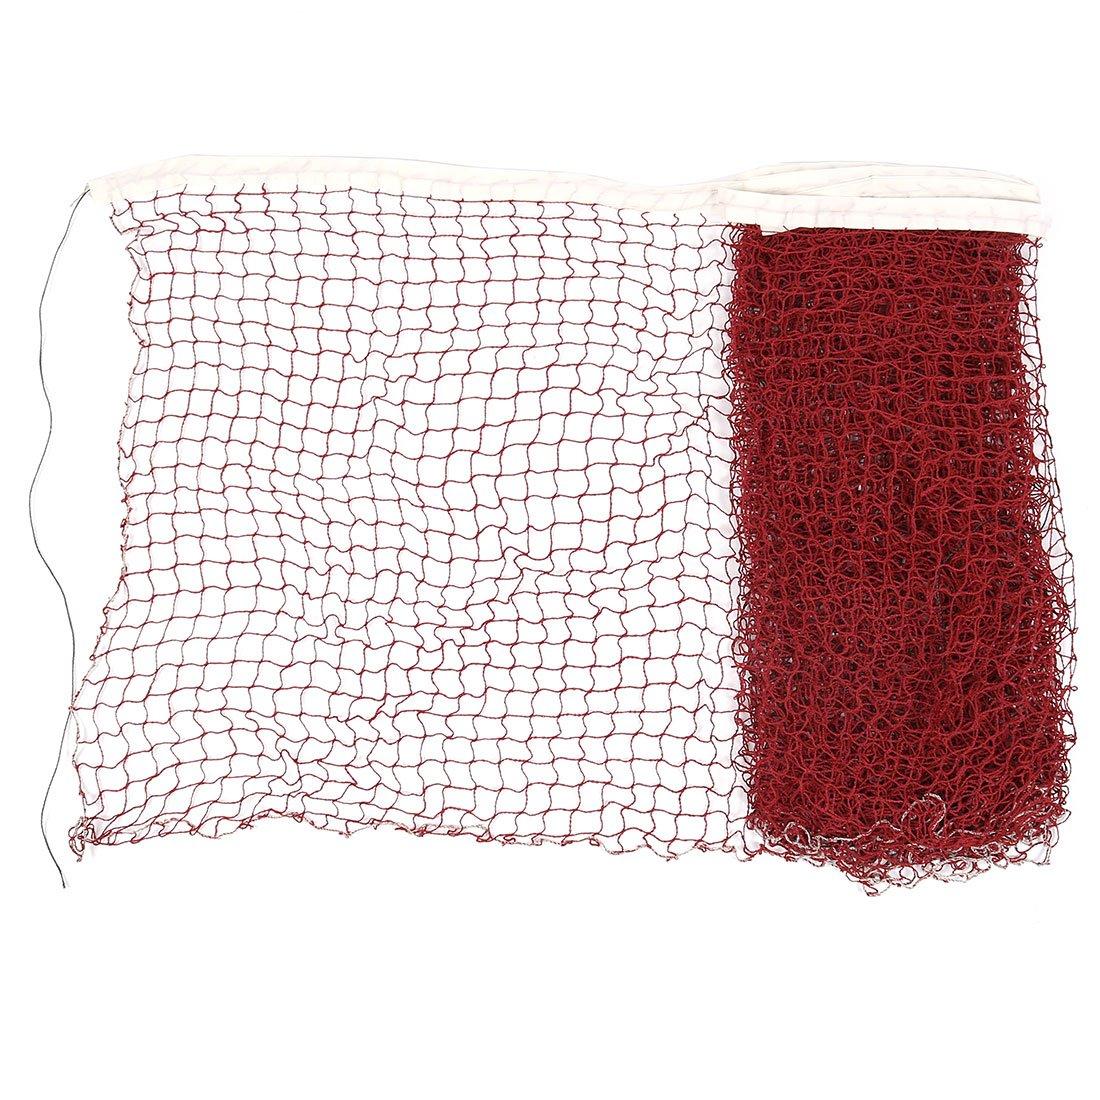 6 x 0.7M Nylon White Trim Burgundy Braided Mesh Badminton Training Net Sourcingmap a11101100ux0027